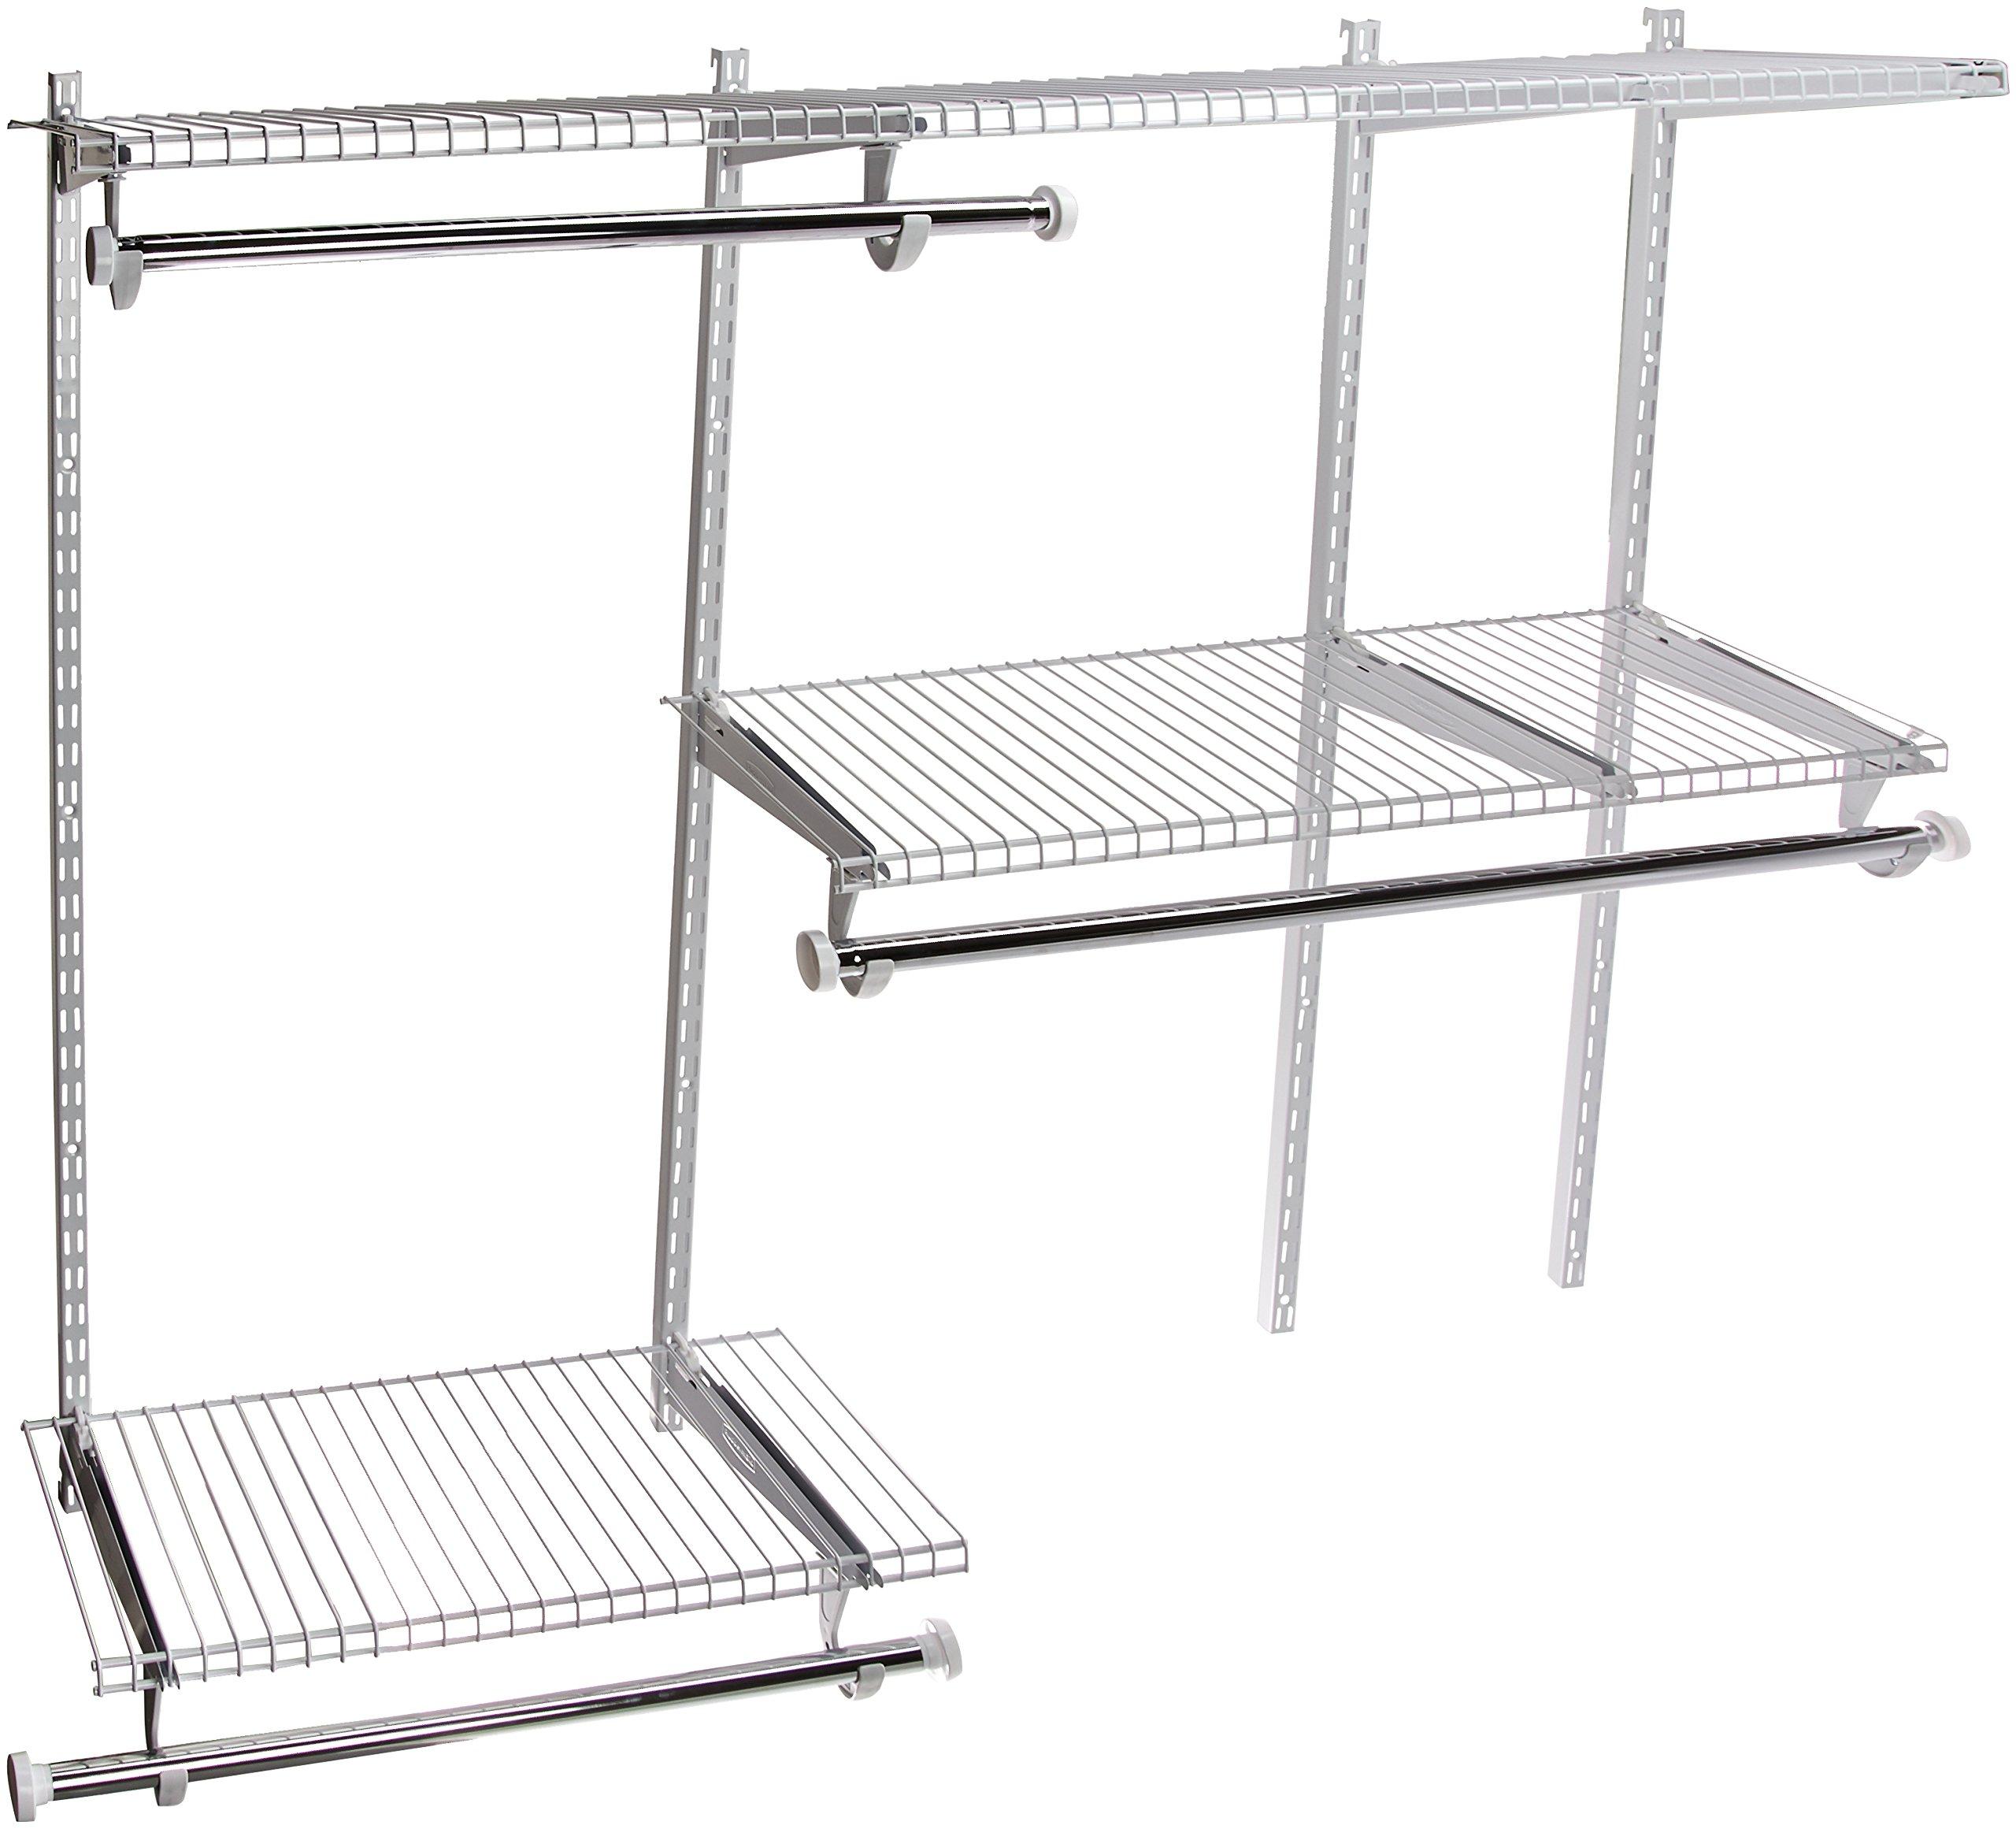 Rubbermaid FG3H1102WHT Configurations Closet Kits, 3-6', White